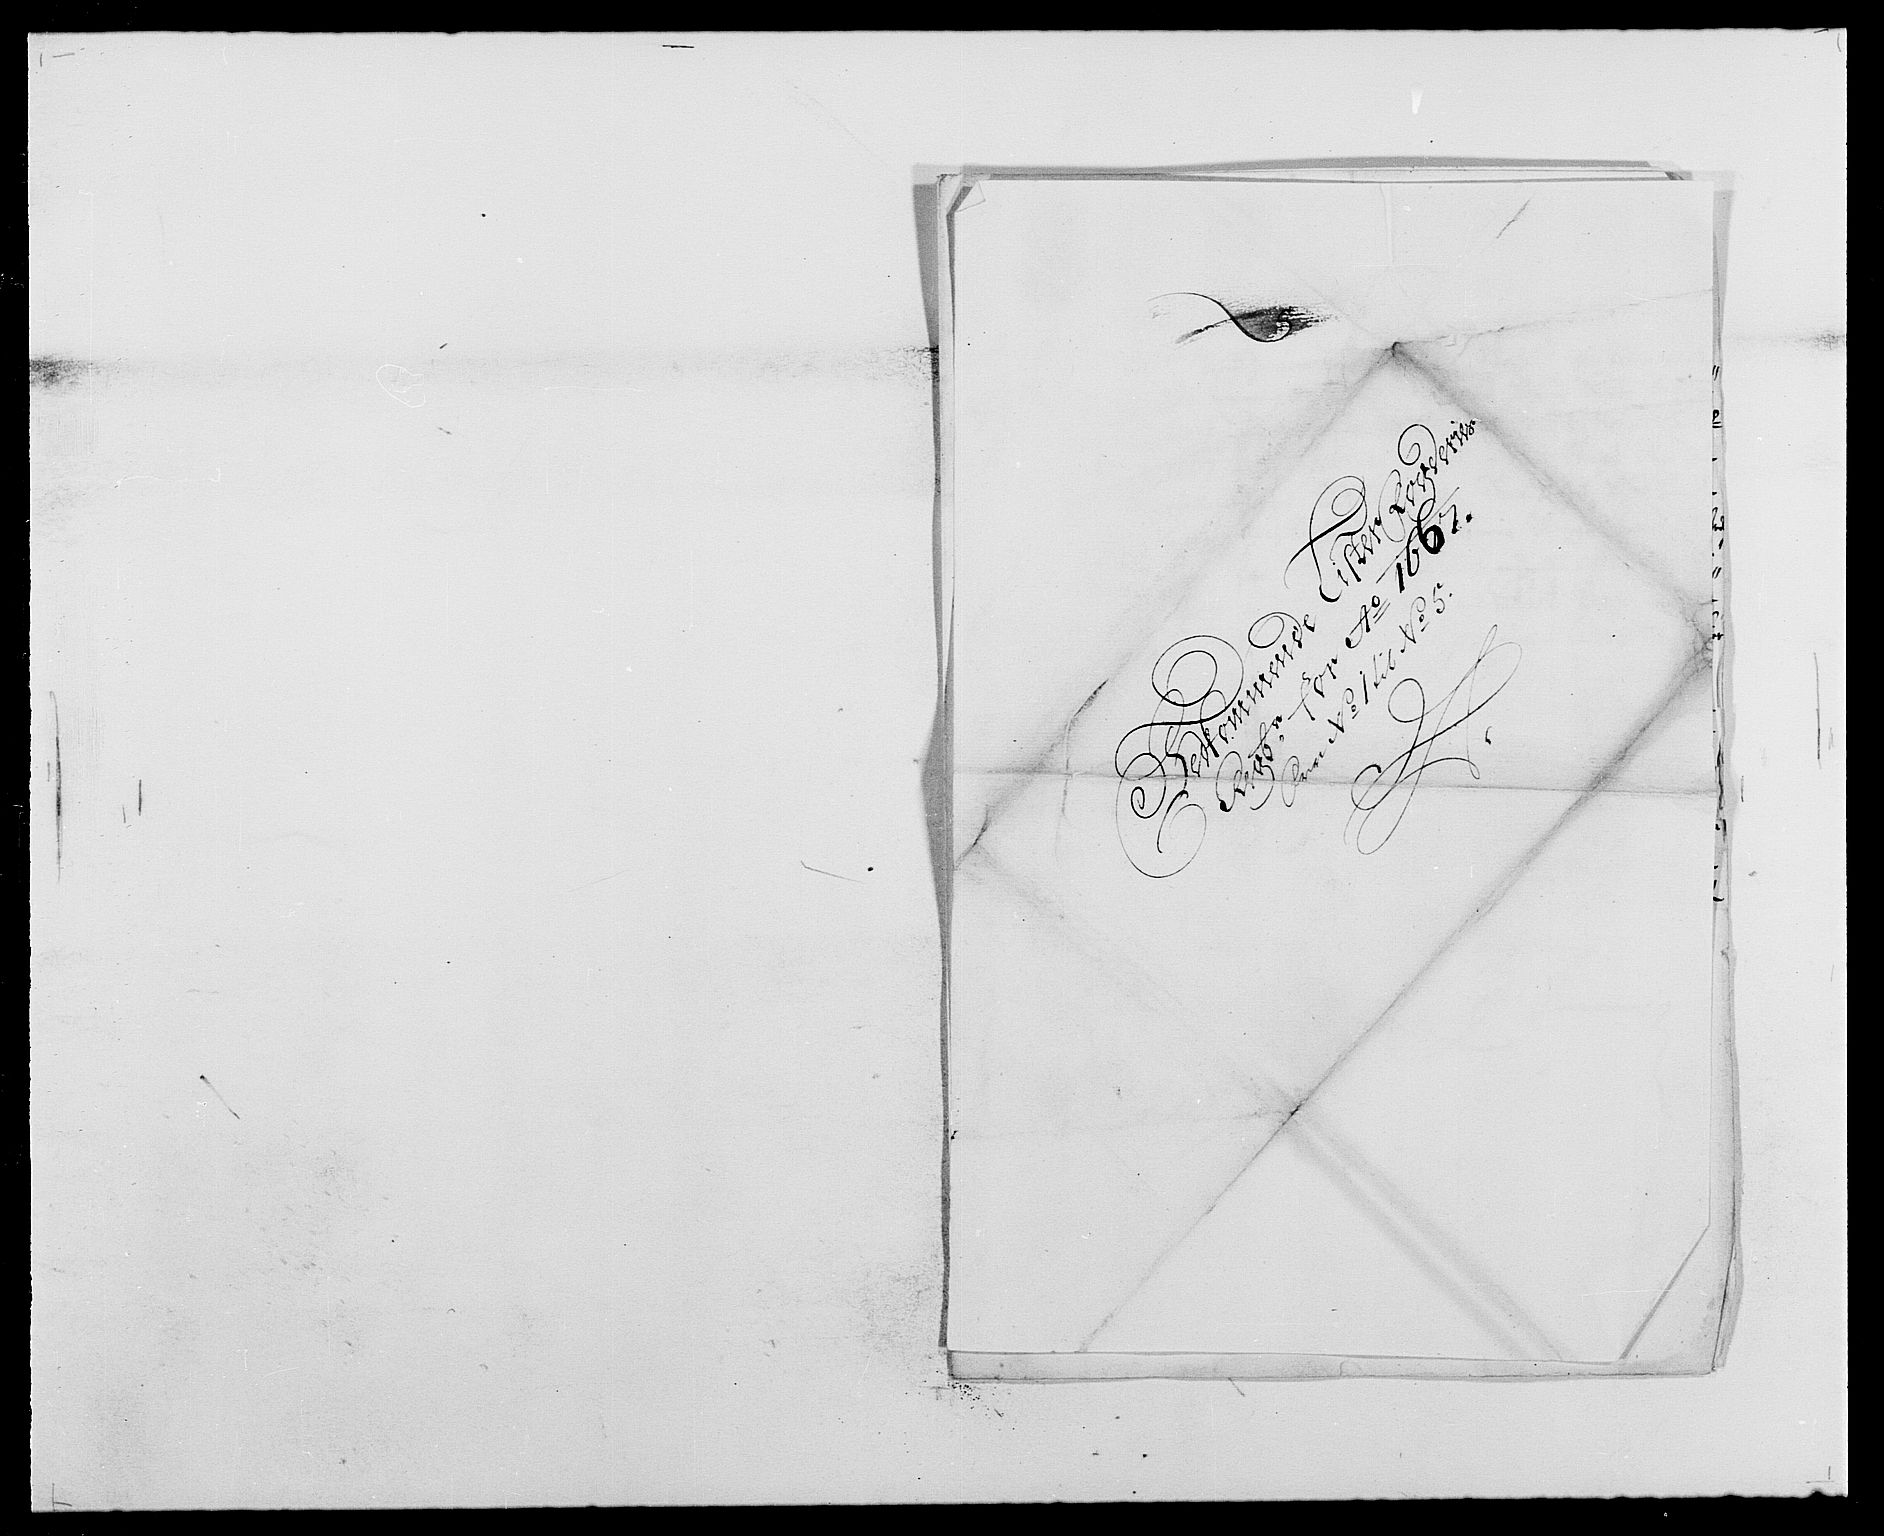 RA, Rentekammeret inntil 1814, Reviderte regnskaper, Fogderegnskap, R41/L2524: Fogderegnskap Lista, 1665-1668, s. 334